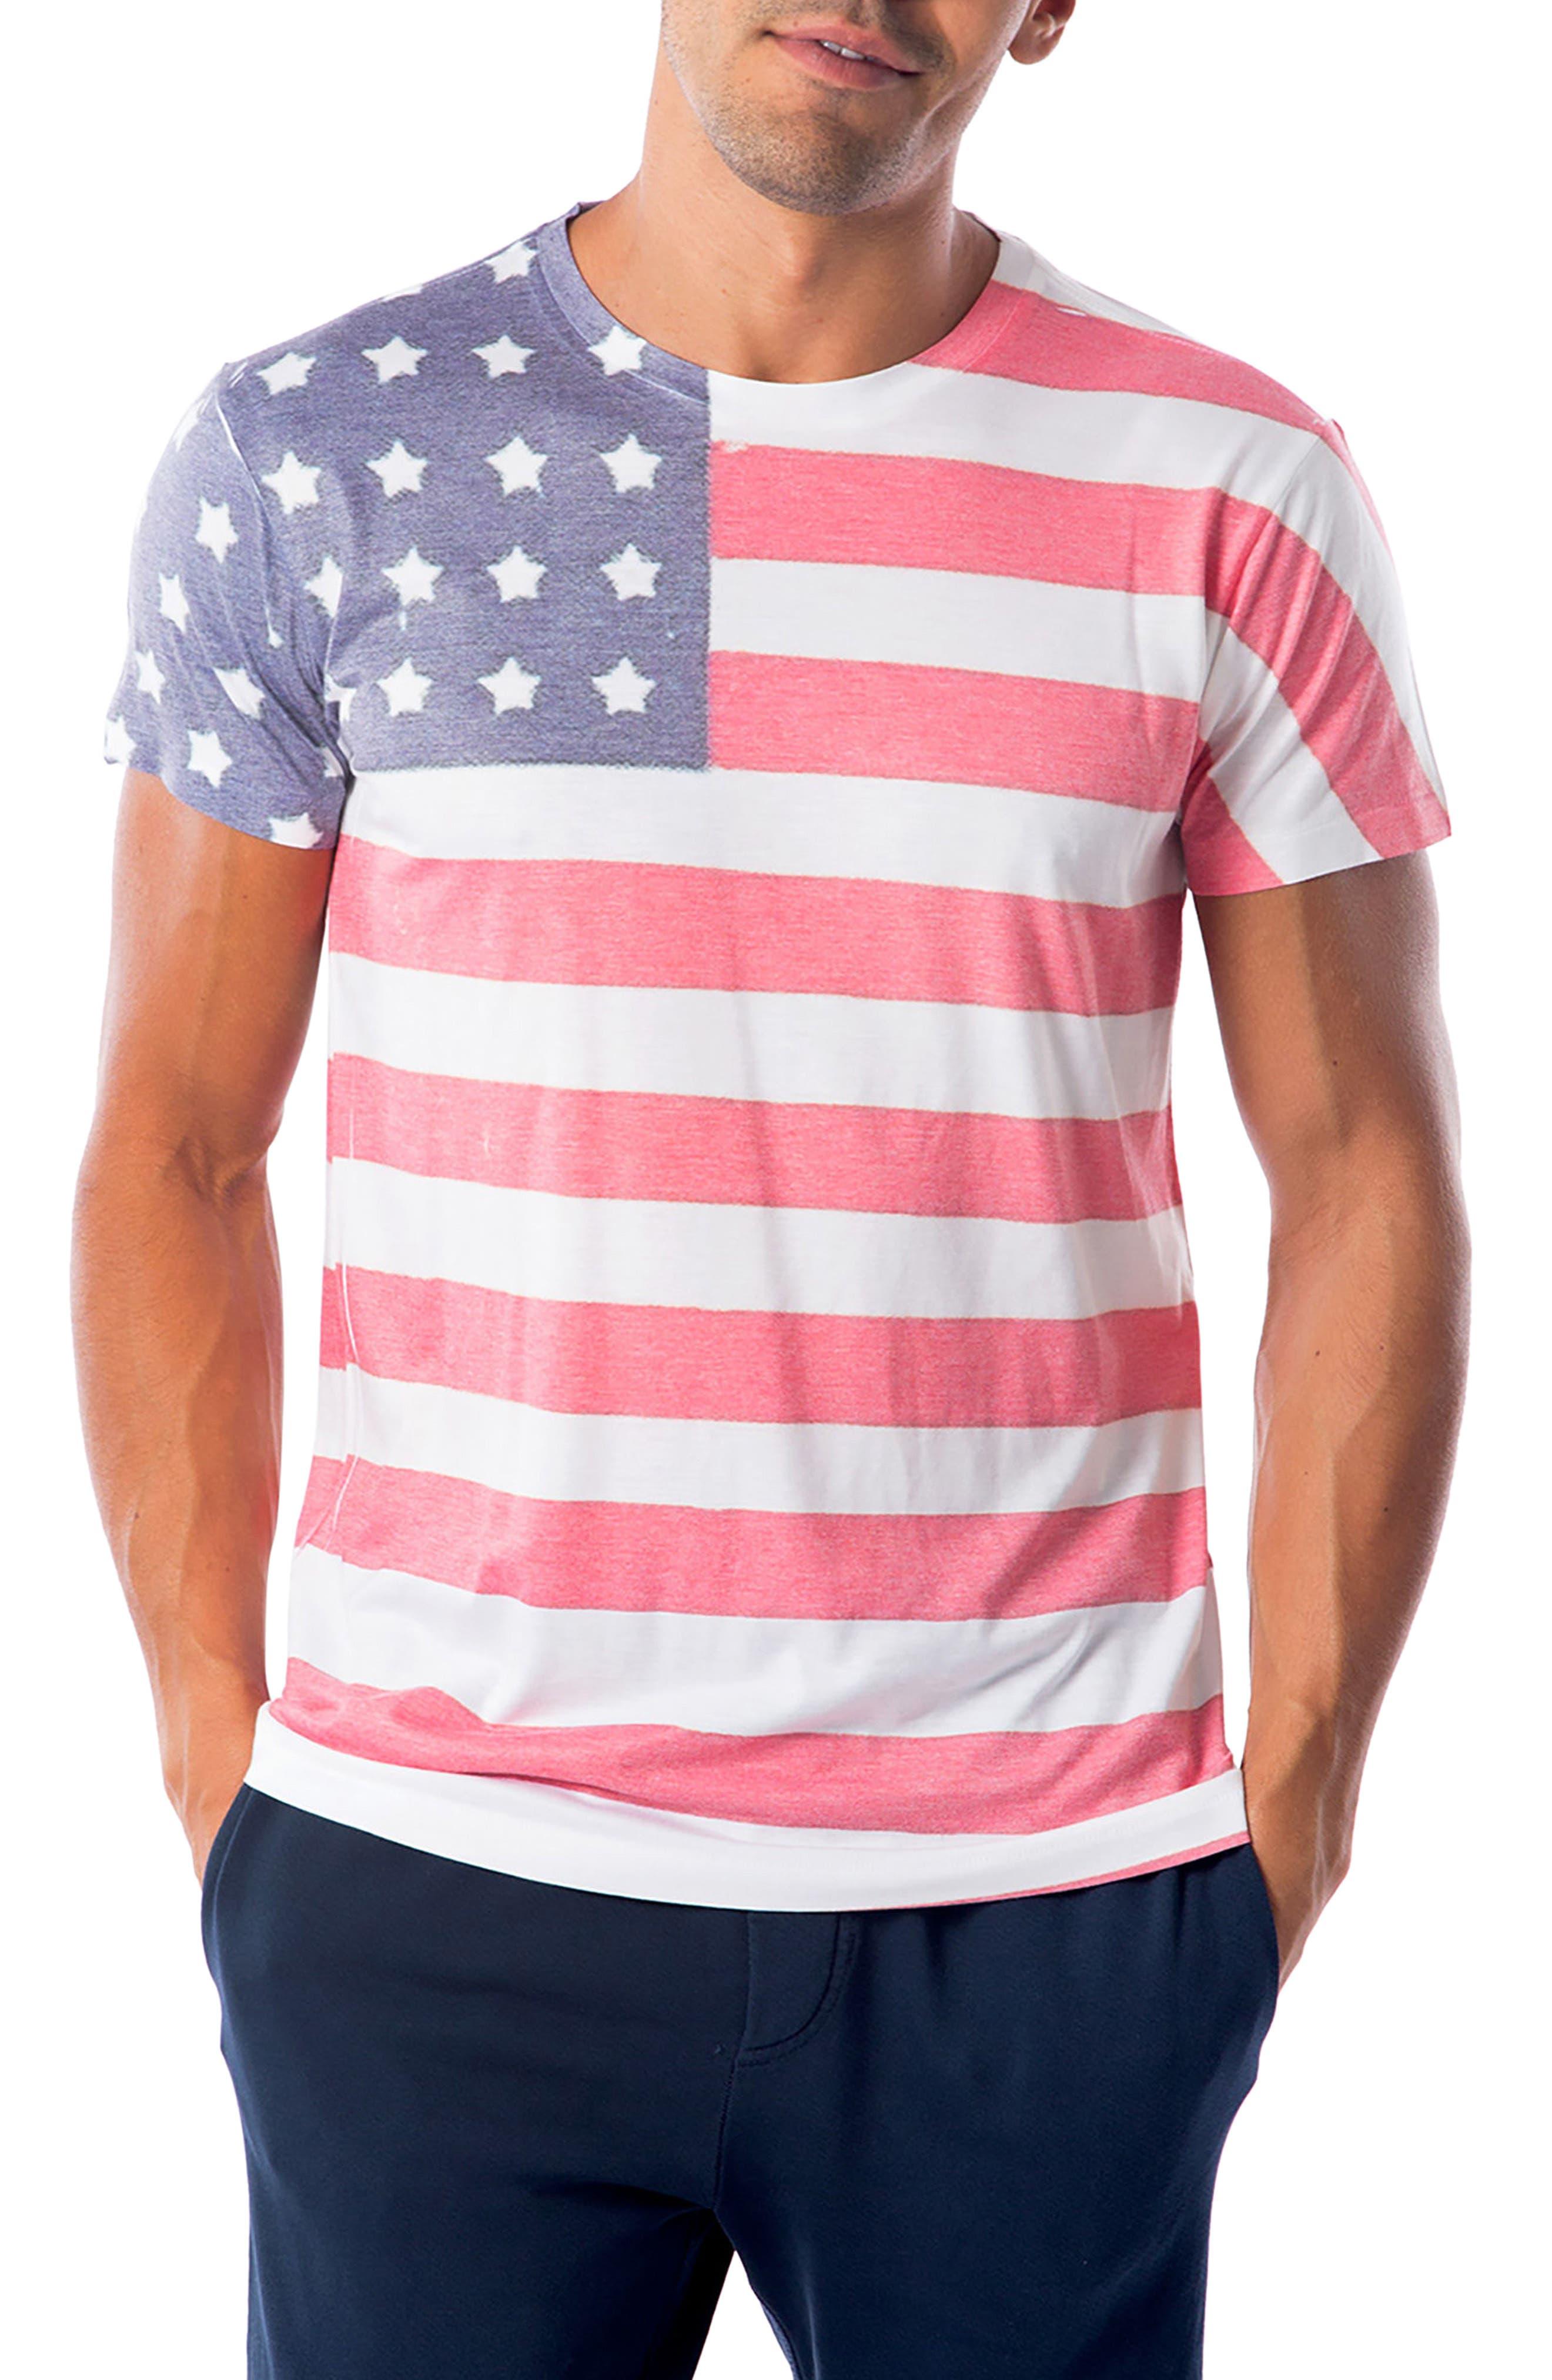 Freedom T-Shirt,                             Main thumbnail 1, color,                             Freedom